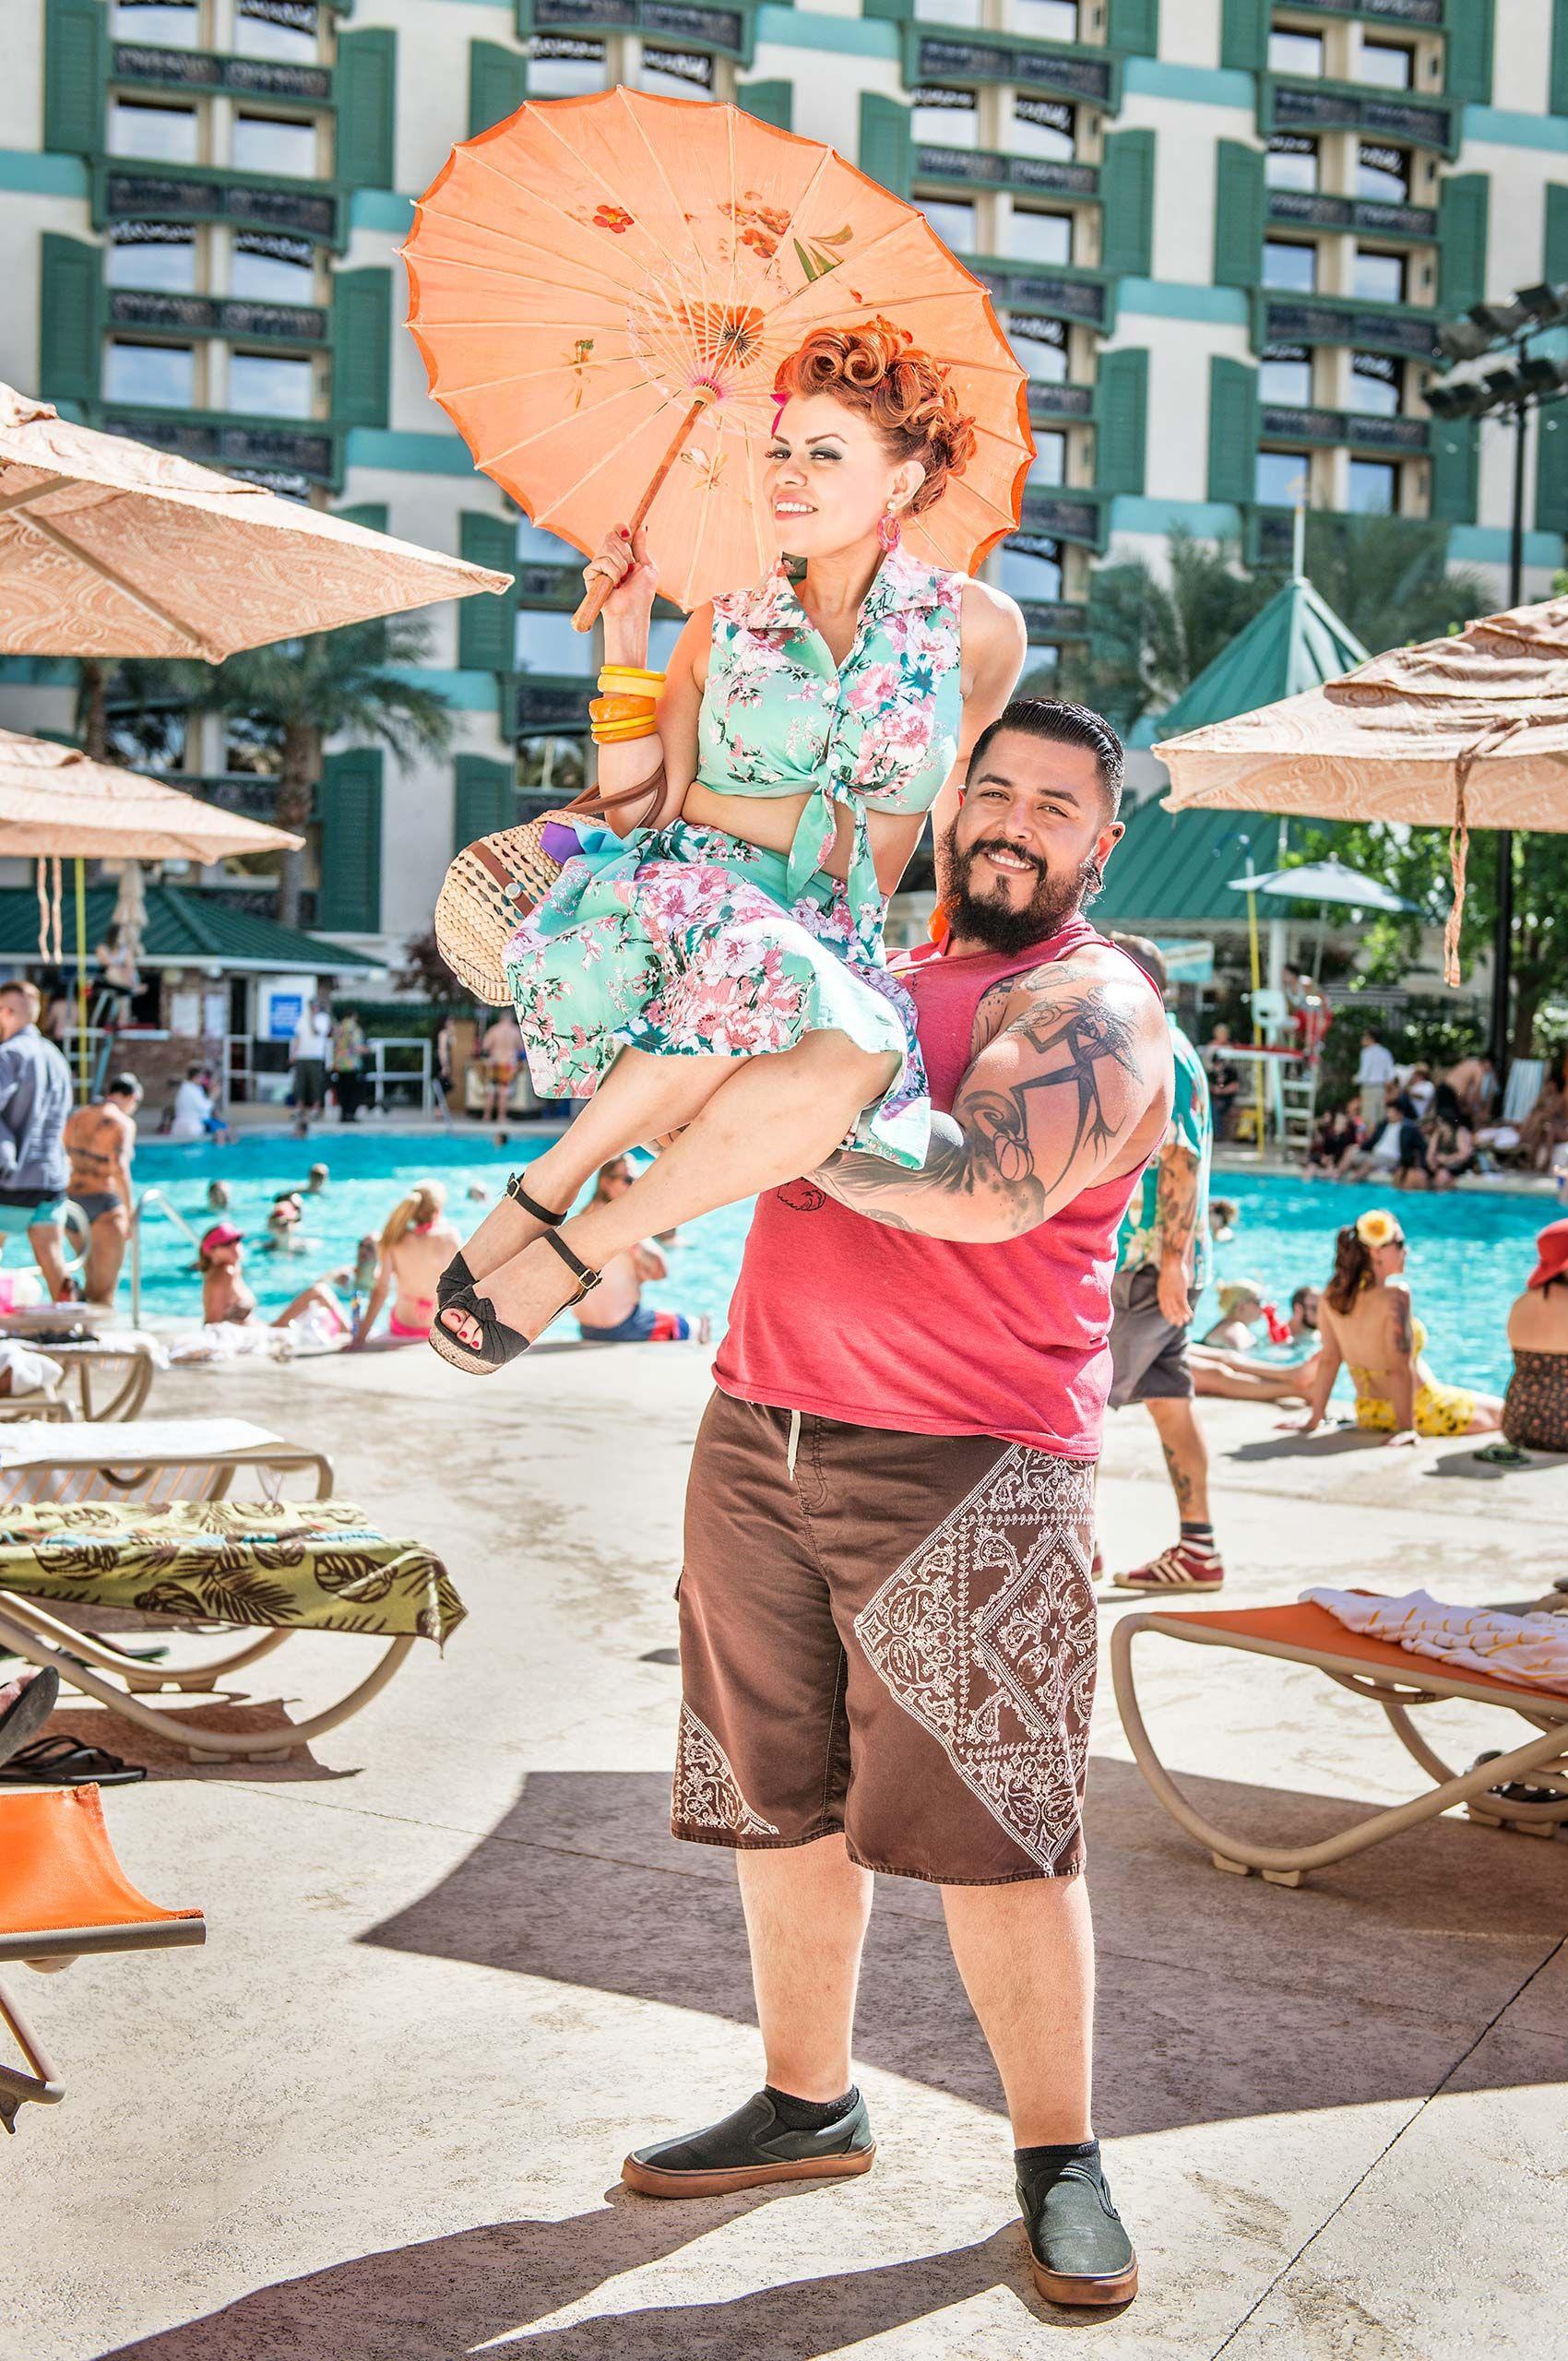 strongest-man-lifting-girl-vivalasvegas-HenrikOlundPhotography.jpg